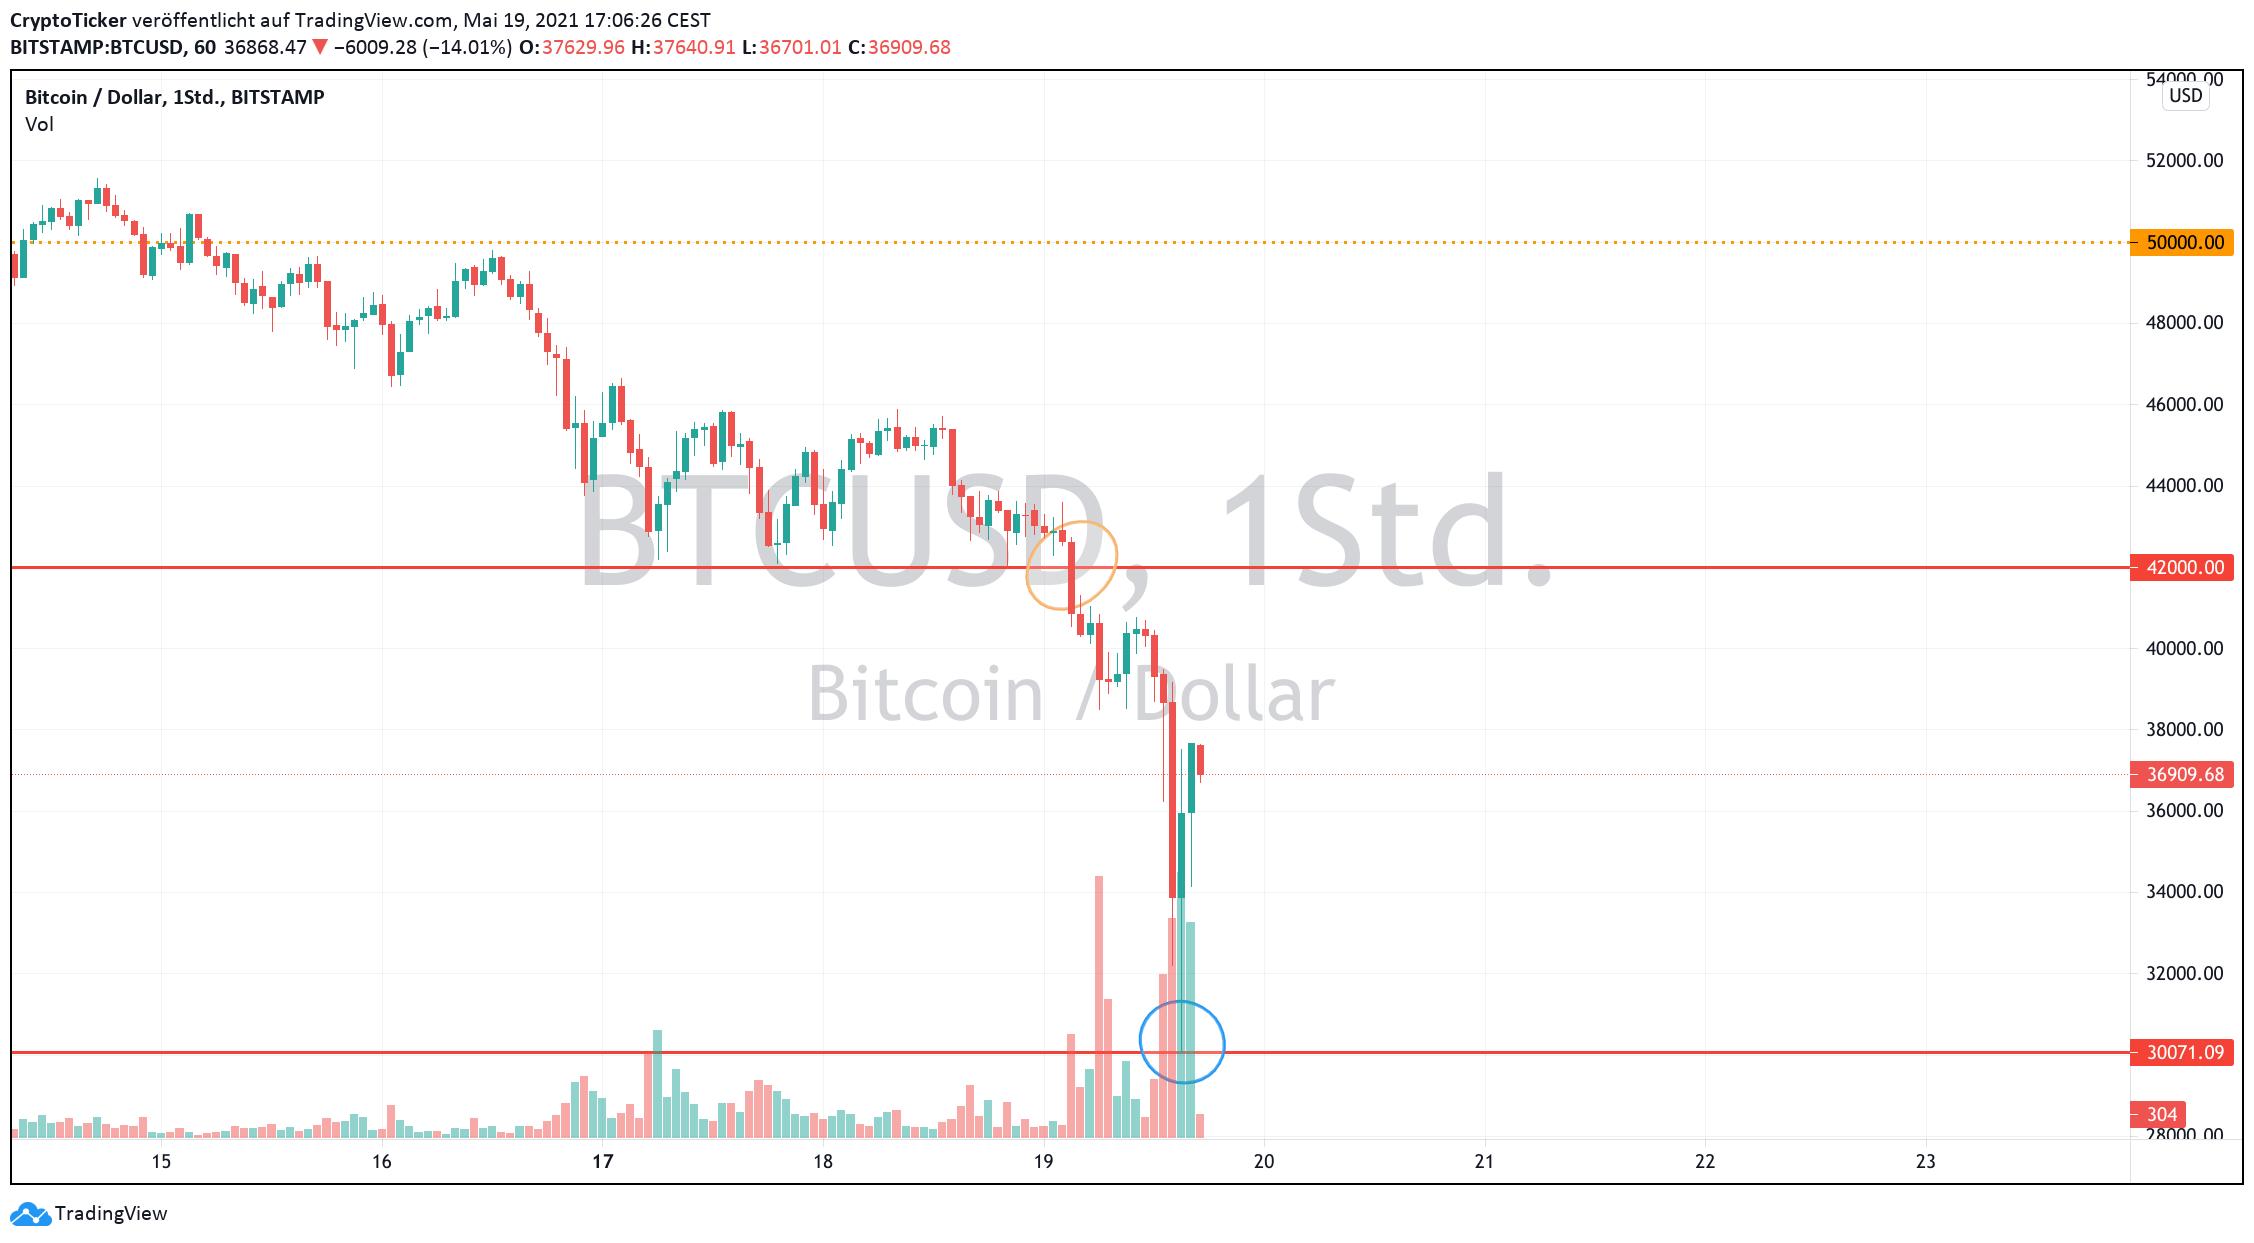 Bitcoin crash: BTC/USD 1-hour chart showing a strong selloff of BTC